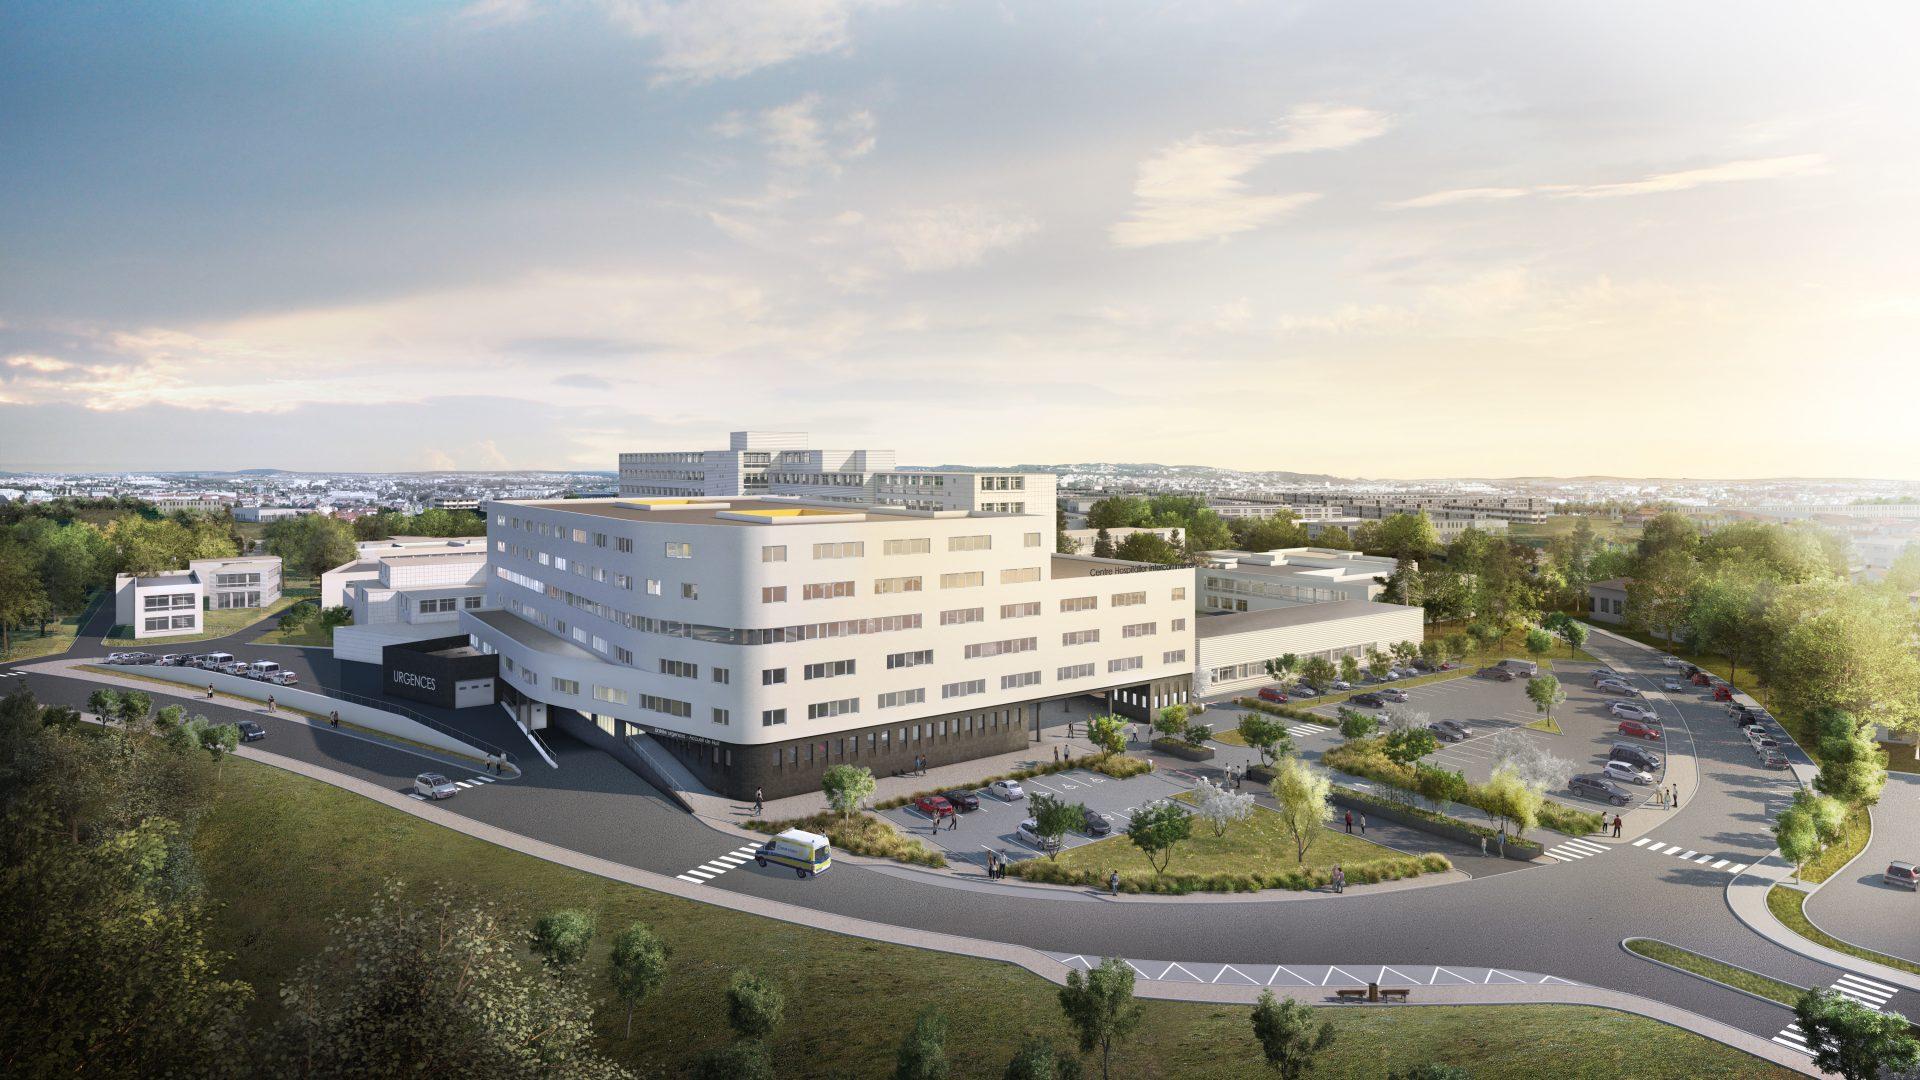 CHIPS - Centre Hospitalier Intercommunal Poissy Saint-Germain-en-Laye